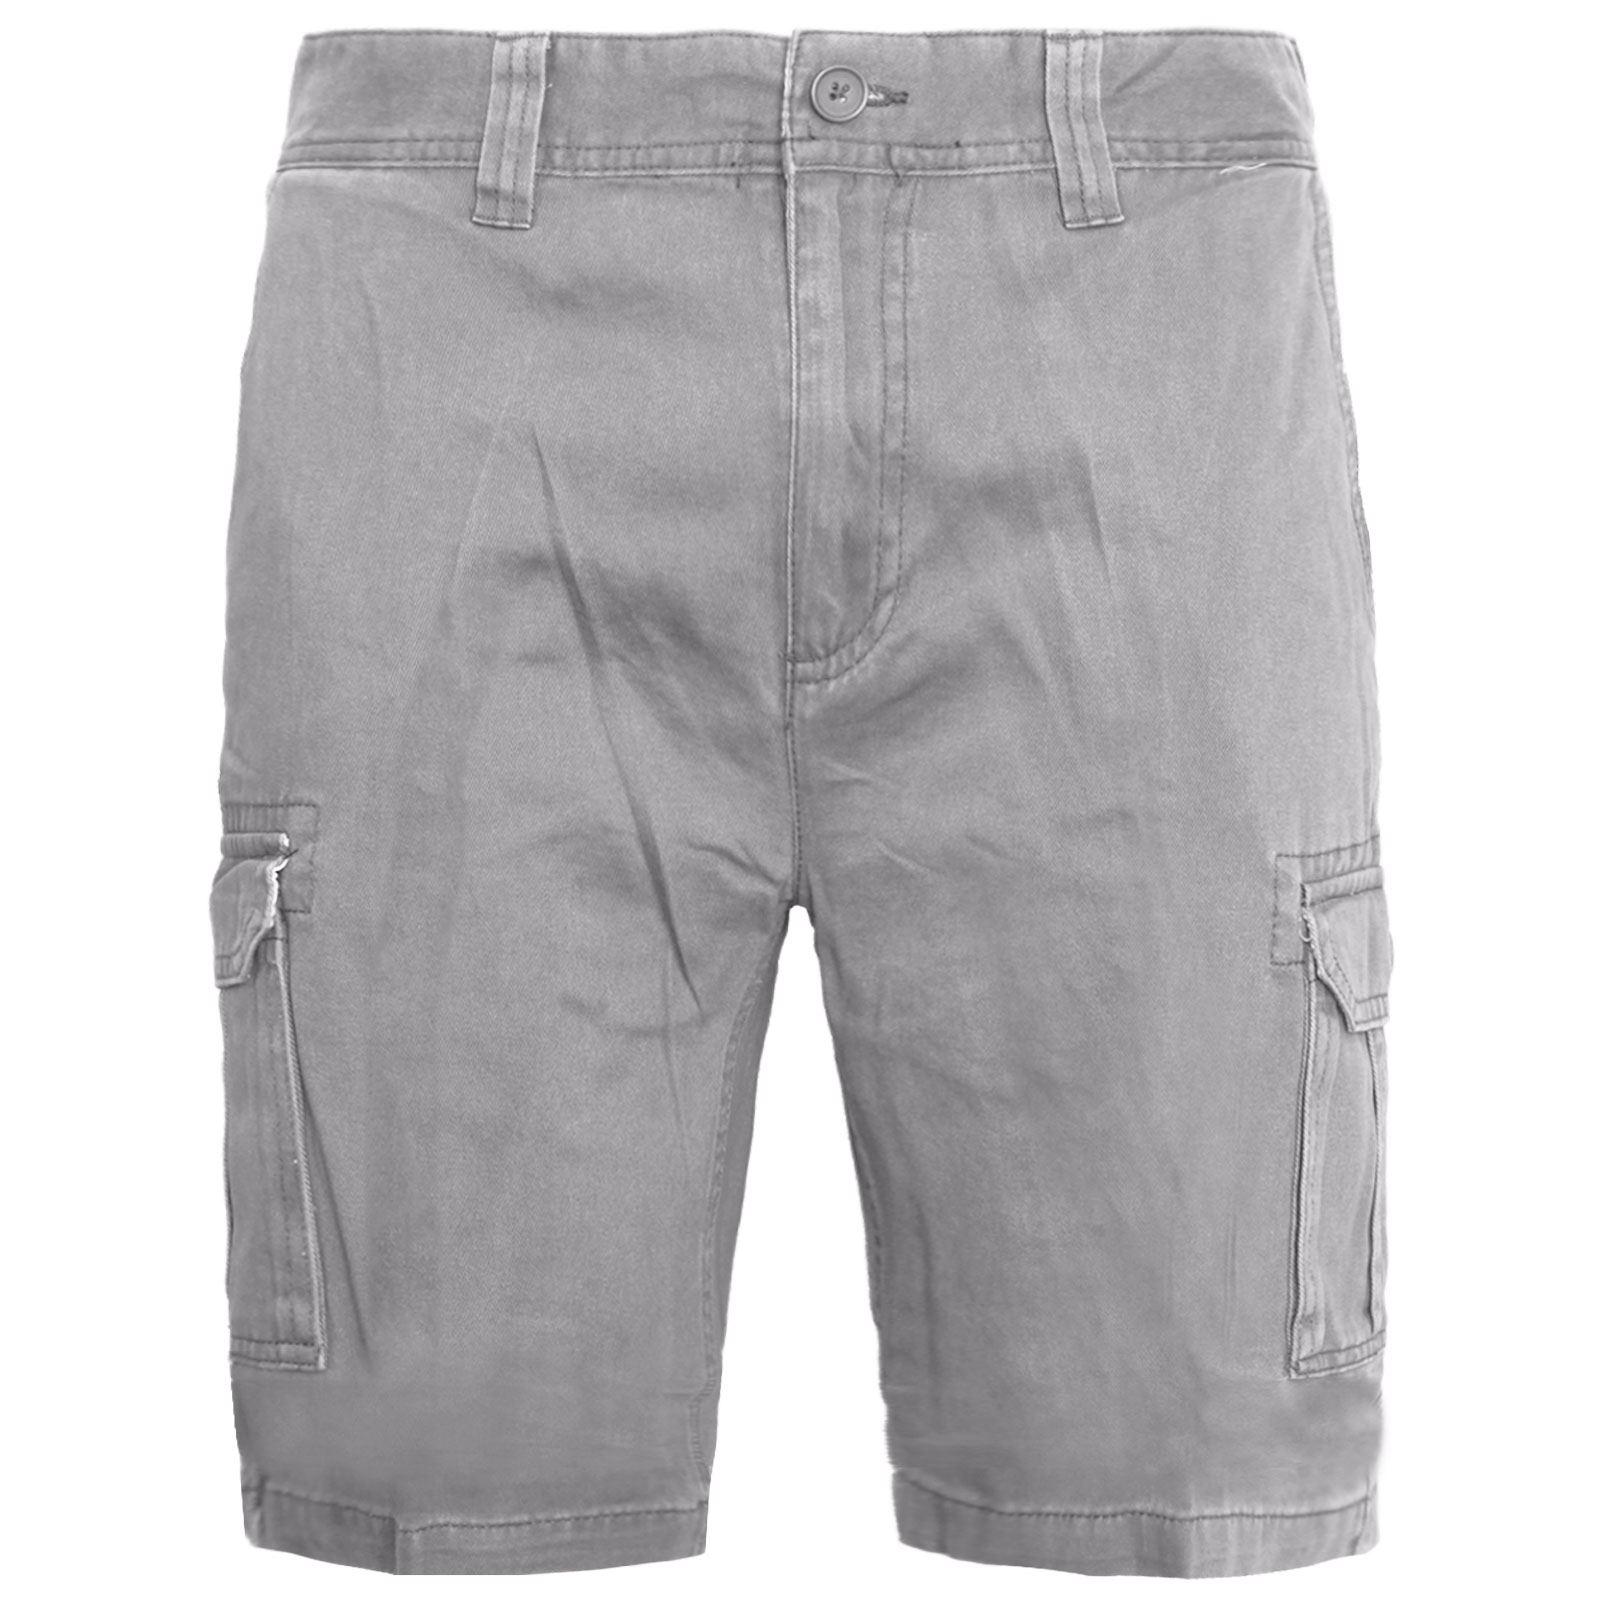 Mens Shorts Denim Summer Cotton Jeans Work Half Pant Casual Designer New